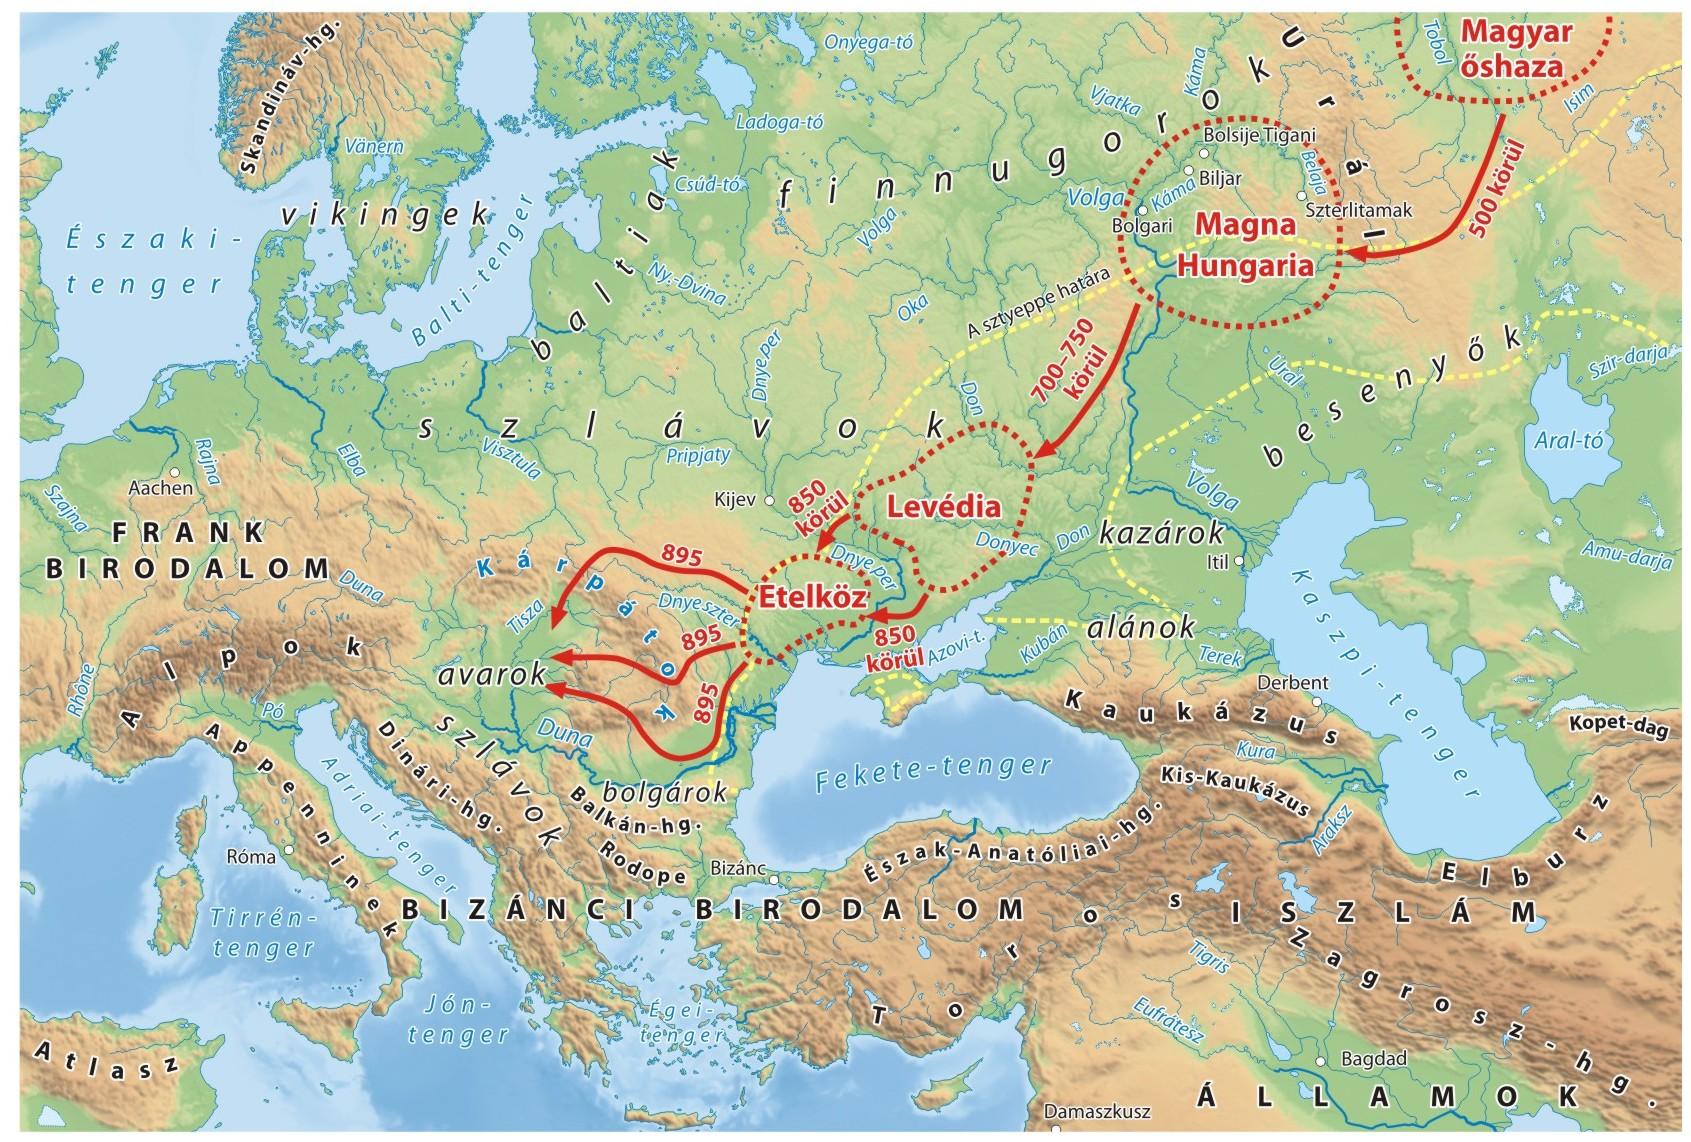 Hungarian migrations